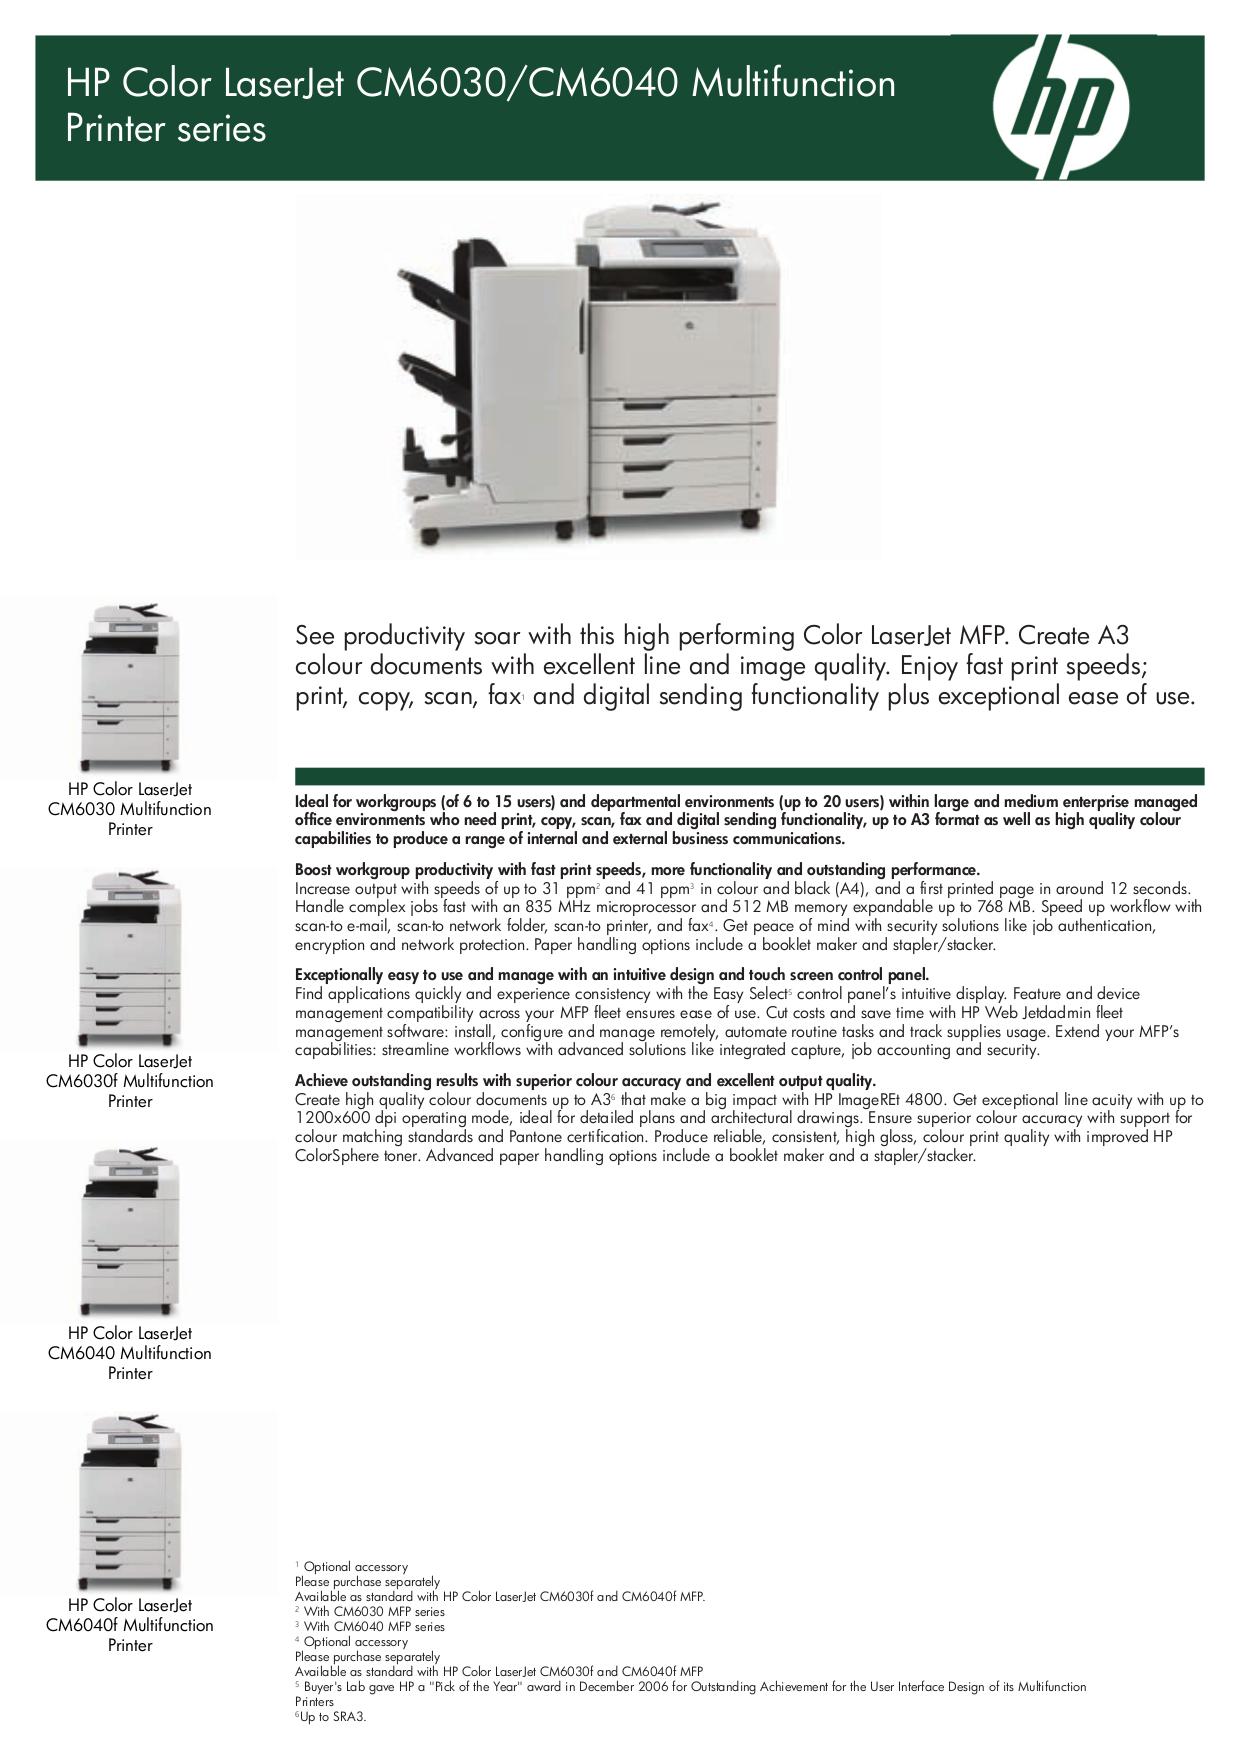 pdf for HP Multifunction Printer Laserjet,Color Laserjet CM6030 manual